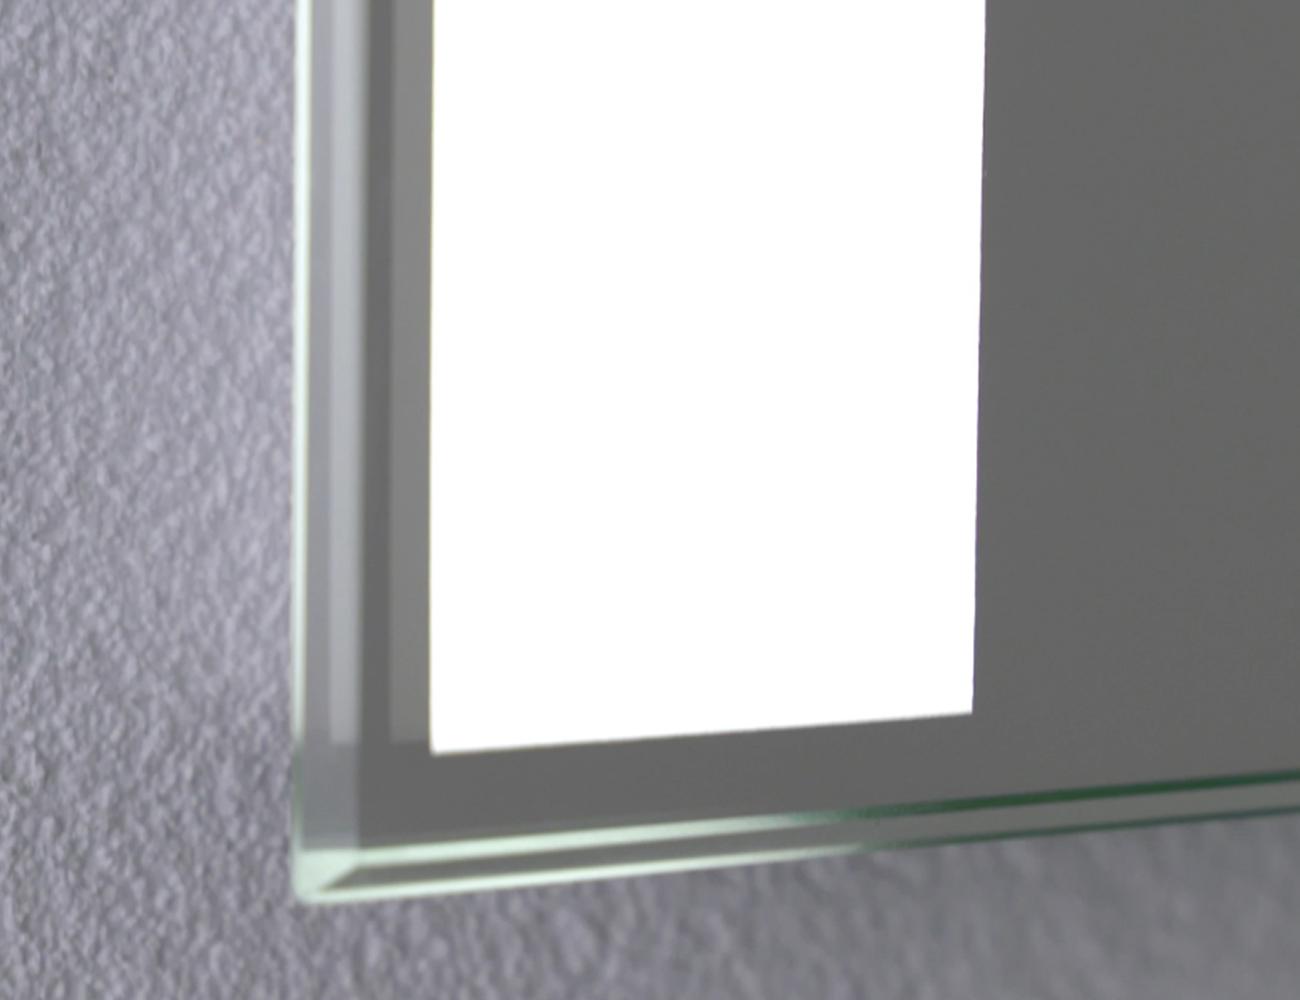 Mw close up uvc mirror task light@2x